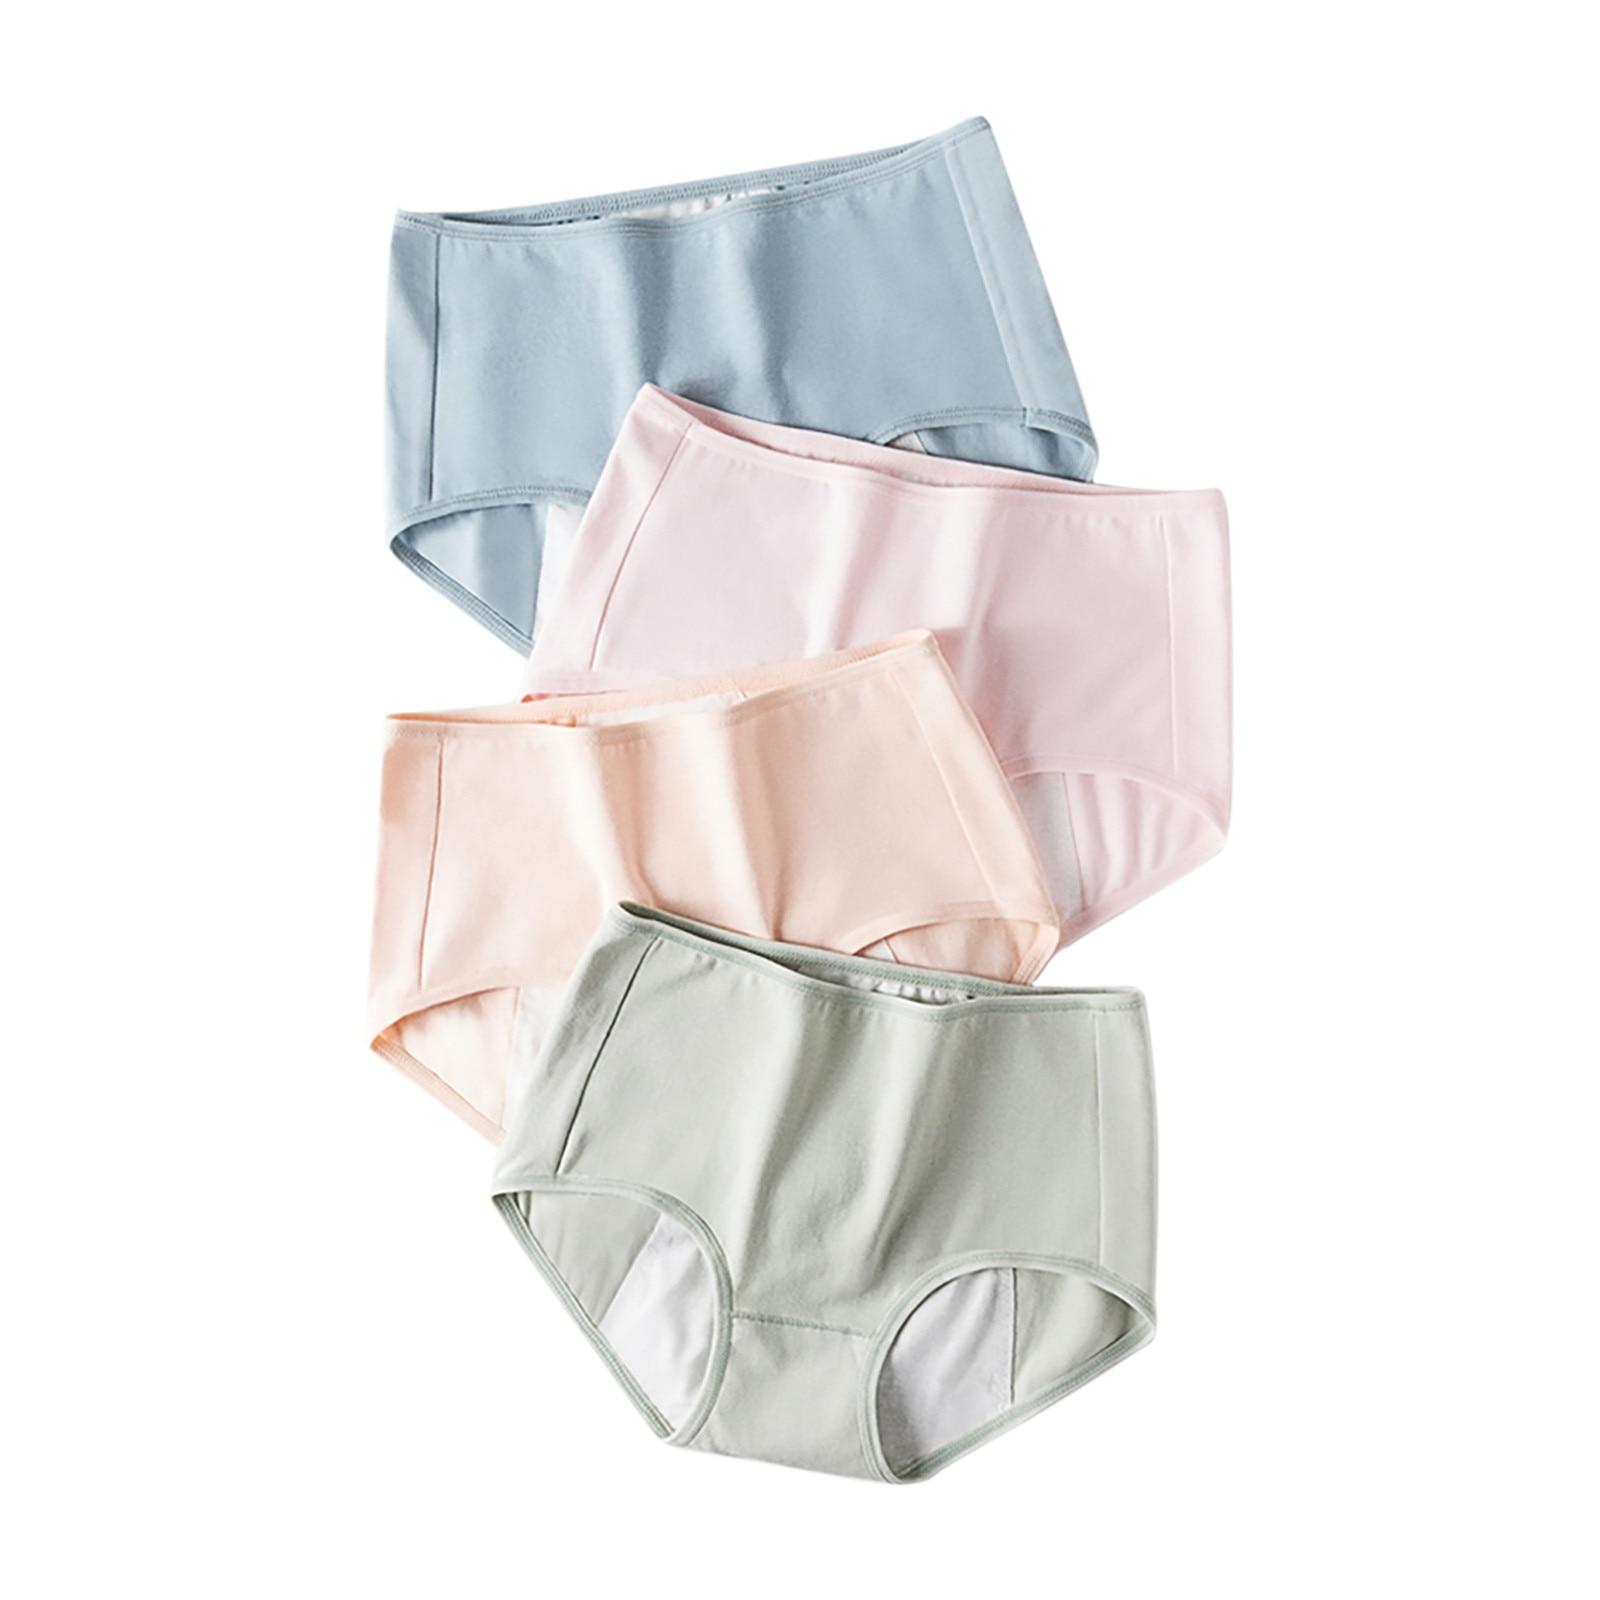 Seamless Mid-waist Breathable Women's Physiological Underwear